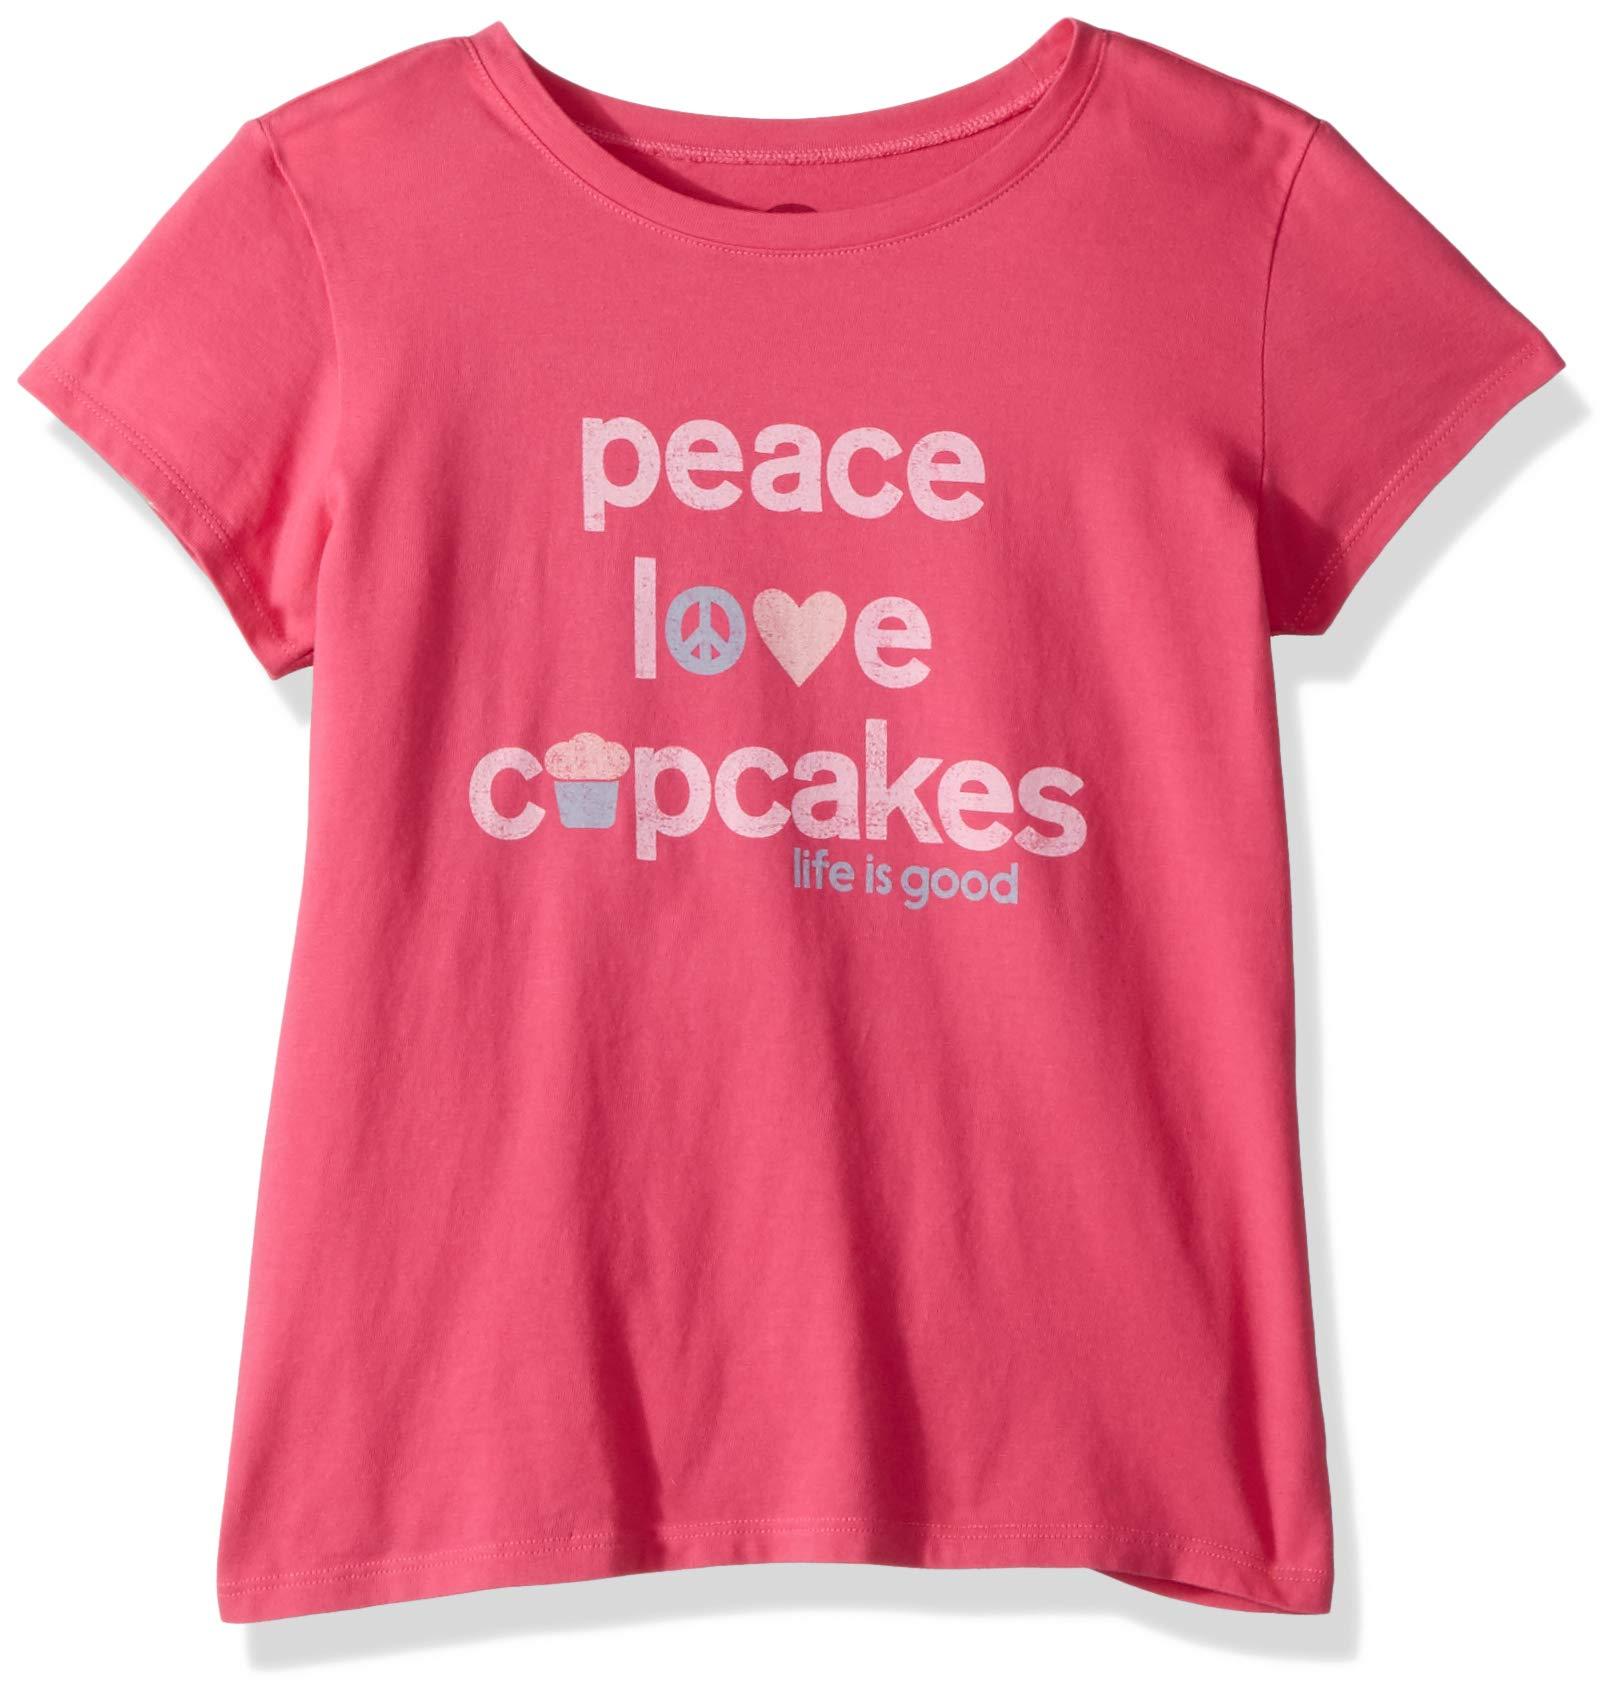 Life is Good Girls Crusher tee Peace Love Cupcakes, Fiesta Pink, Large